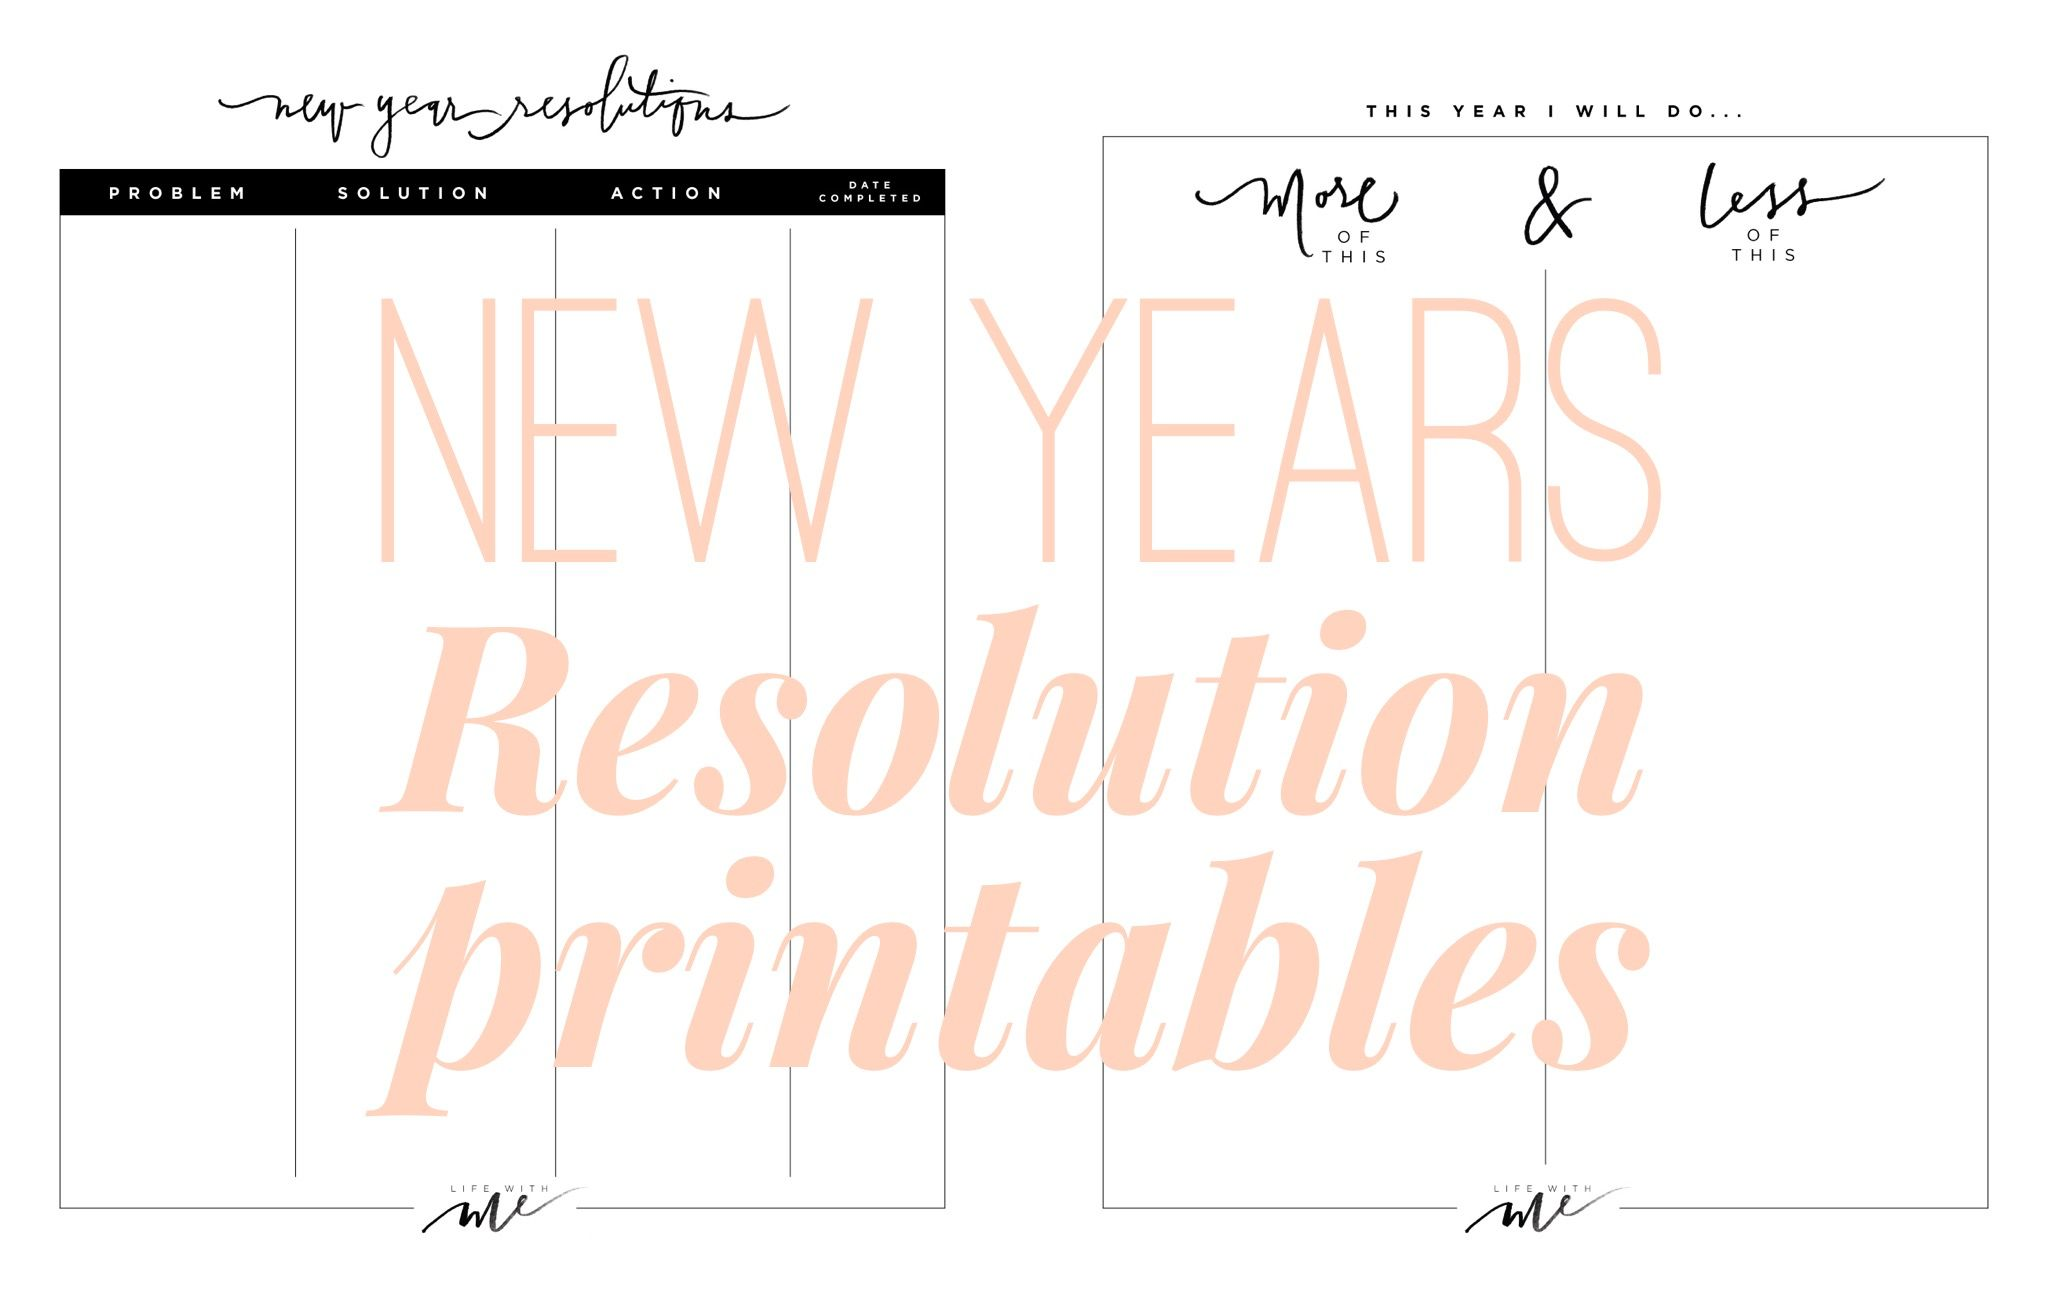 Marianna Hewitt New Year Resolution Goal Sheet Printable